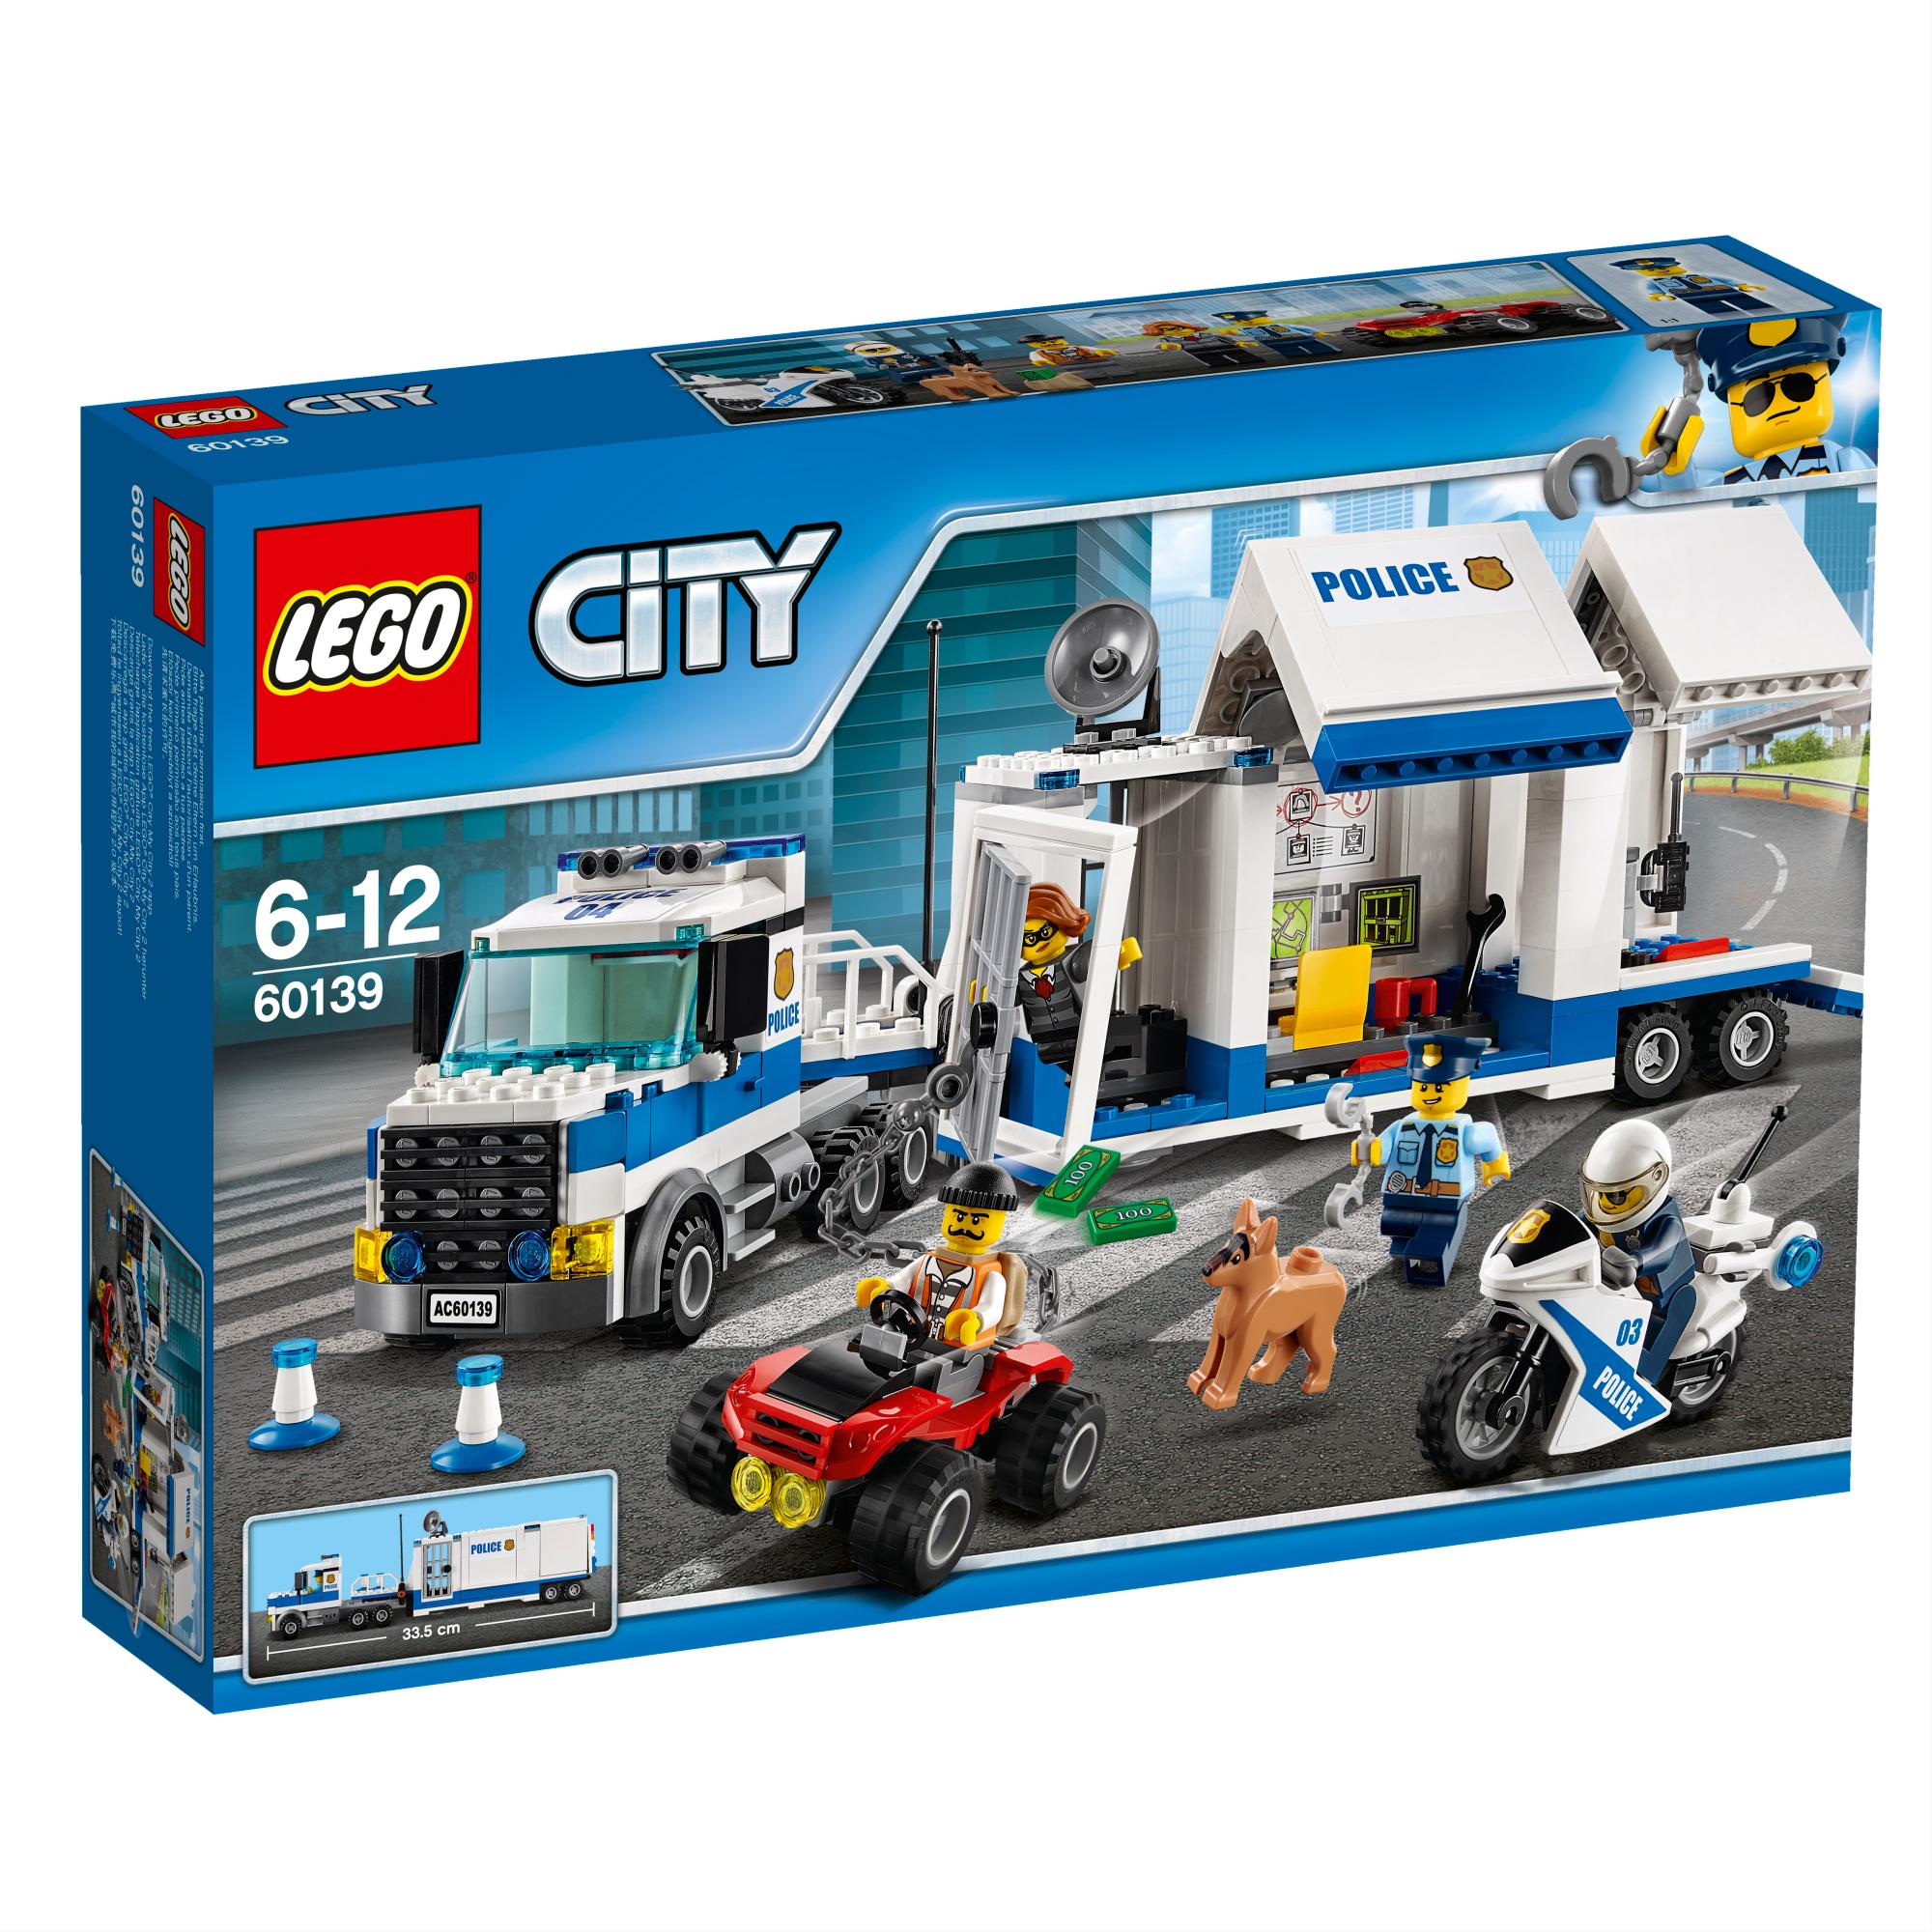 Meter Strawberry health  60139 - Centro di comando mobile - Lego City - Toys Center